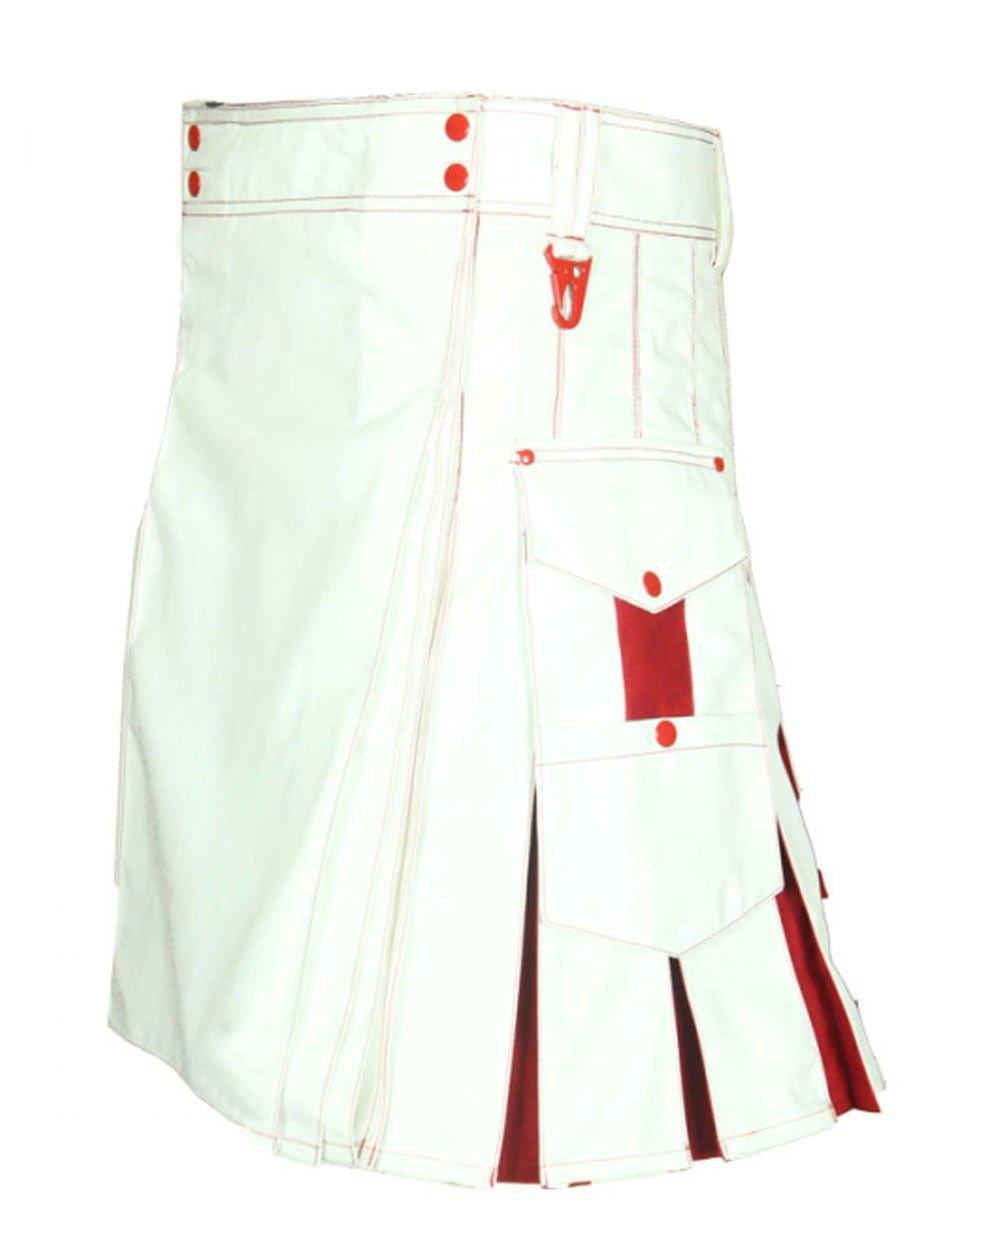 DC Traditional White Scottish Modern Utility Kilt Handmade 100% Cotton Size 60